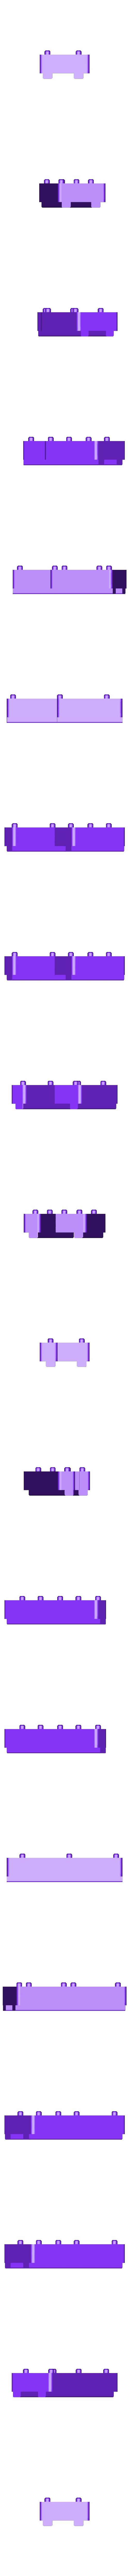 BASE SUPPORT.stl Download free STL file Quick Detachable Ender 3 PSU Power Supply MOUNT • 3D printer object, nrnathan